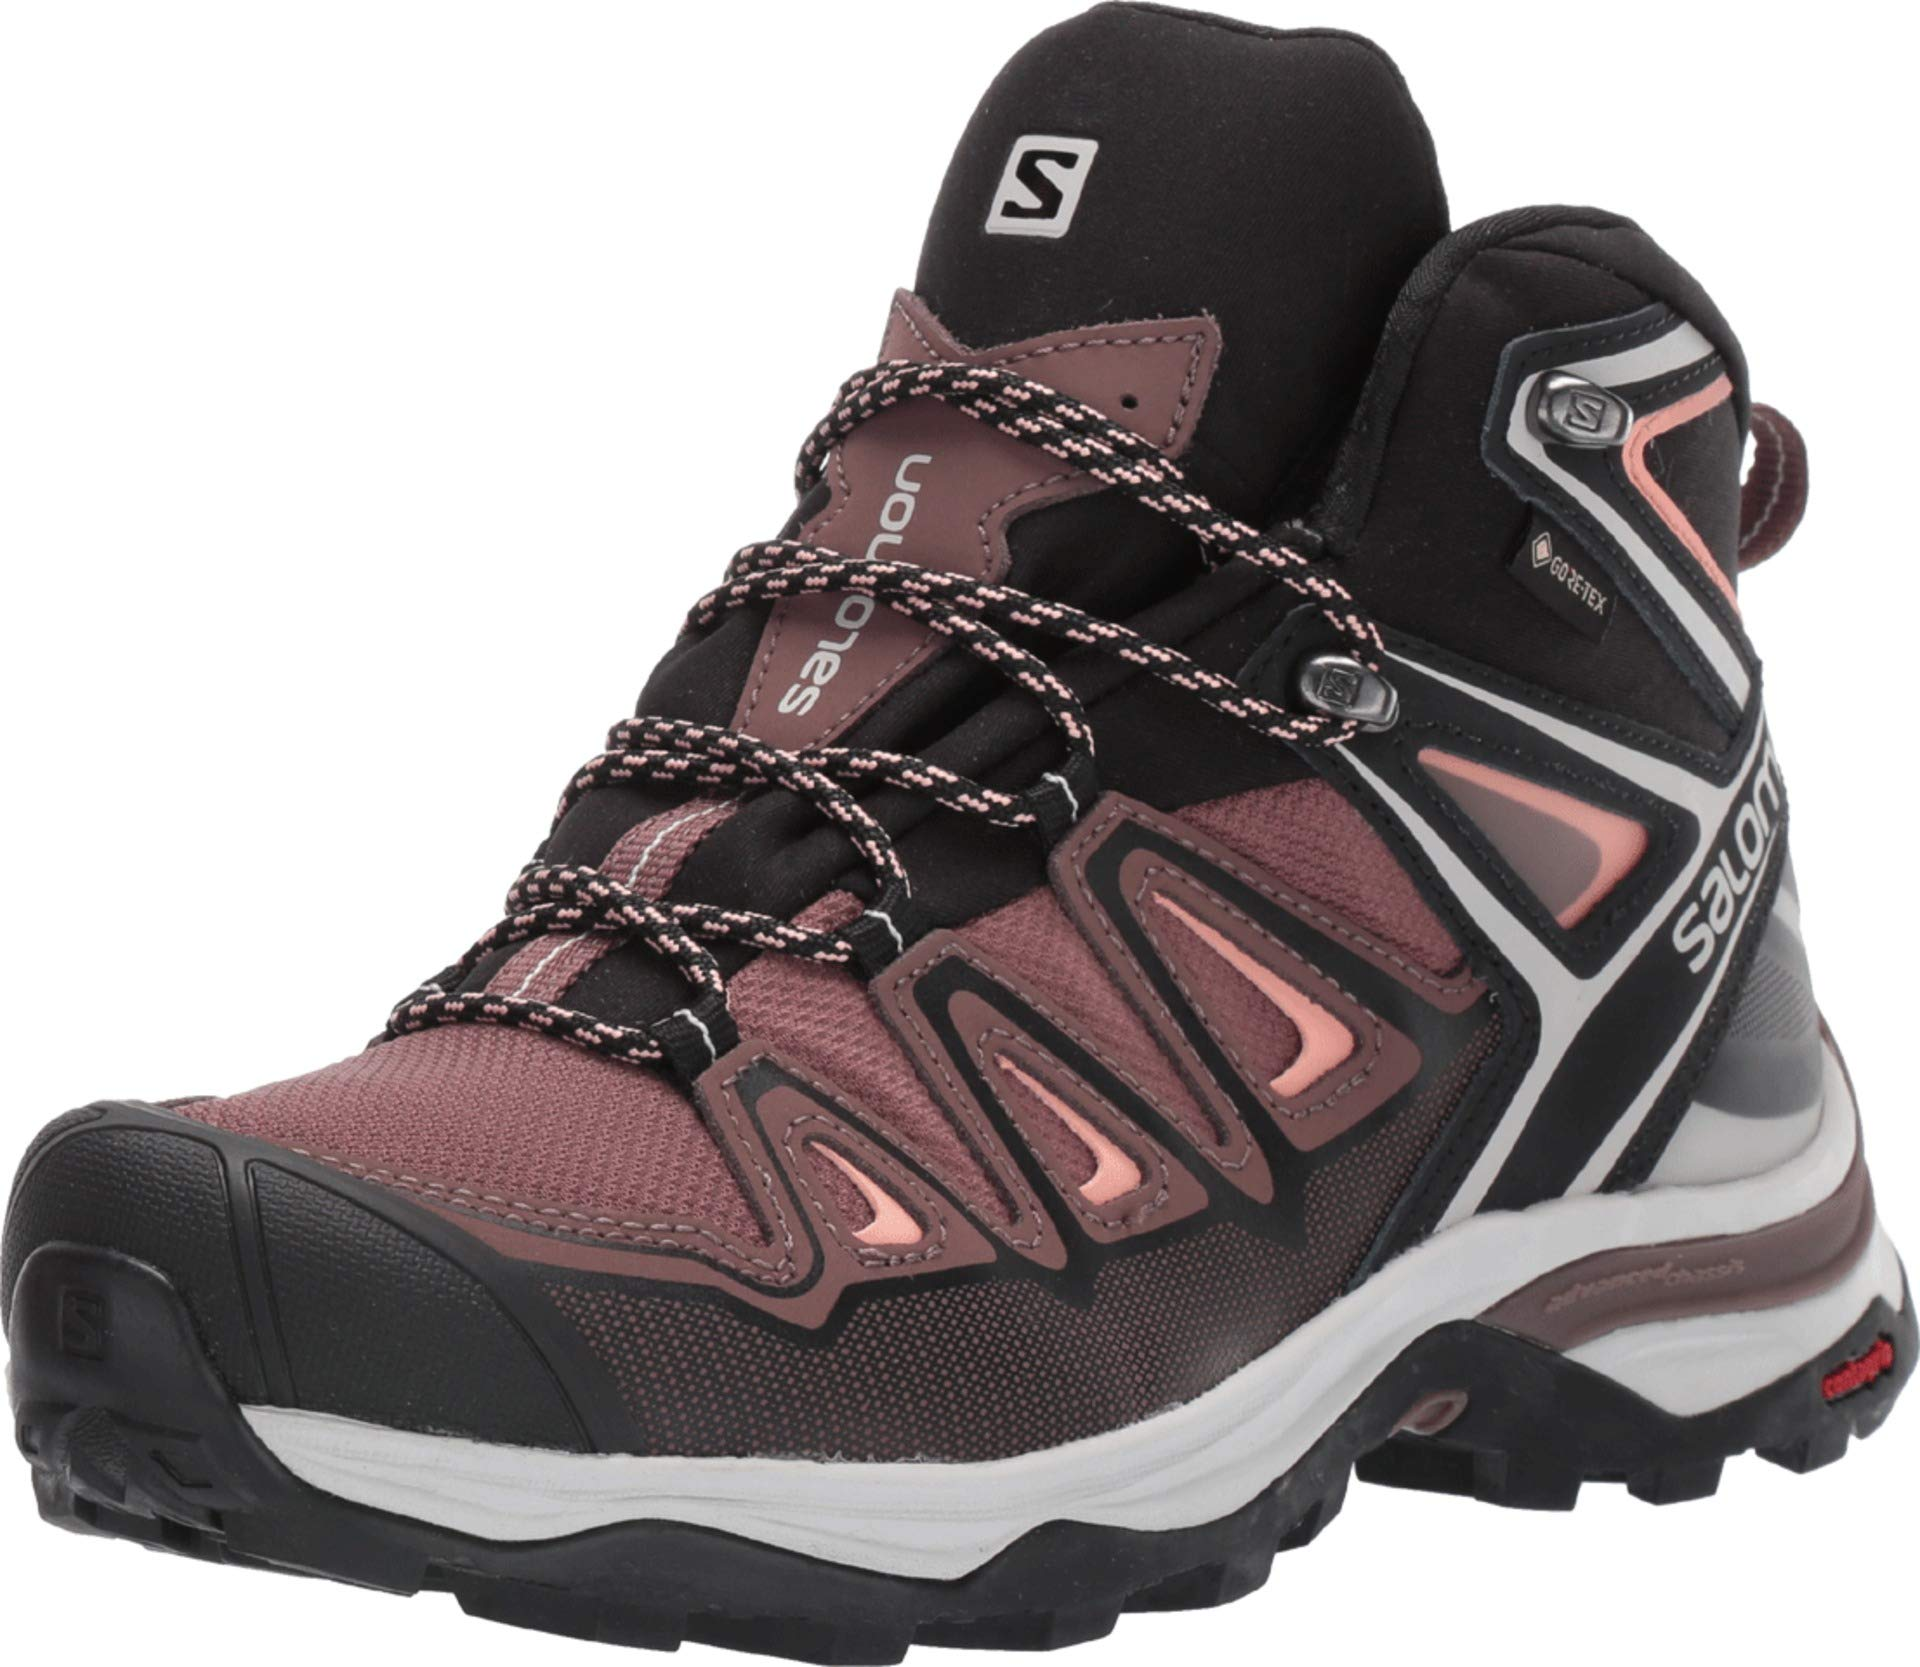 Salomon Women's X Ultra 3 Mid GTX Hiking Boots, Peppercorn/Black/Coral Almond, 9 by SALOMON